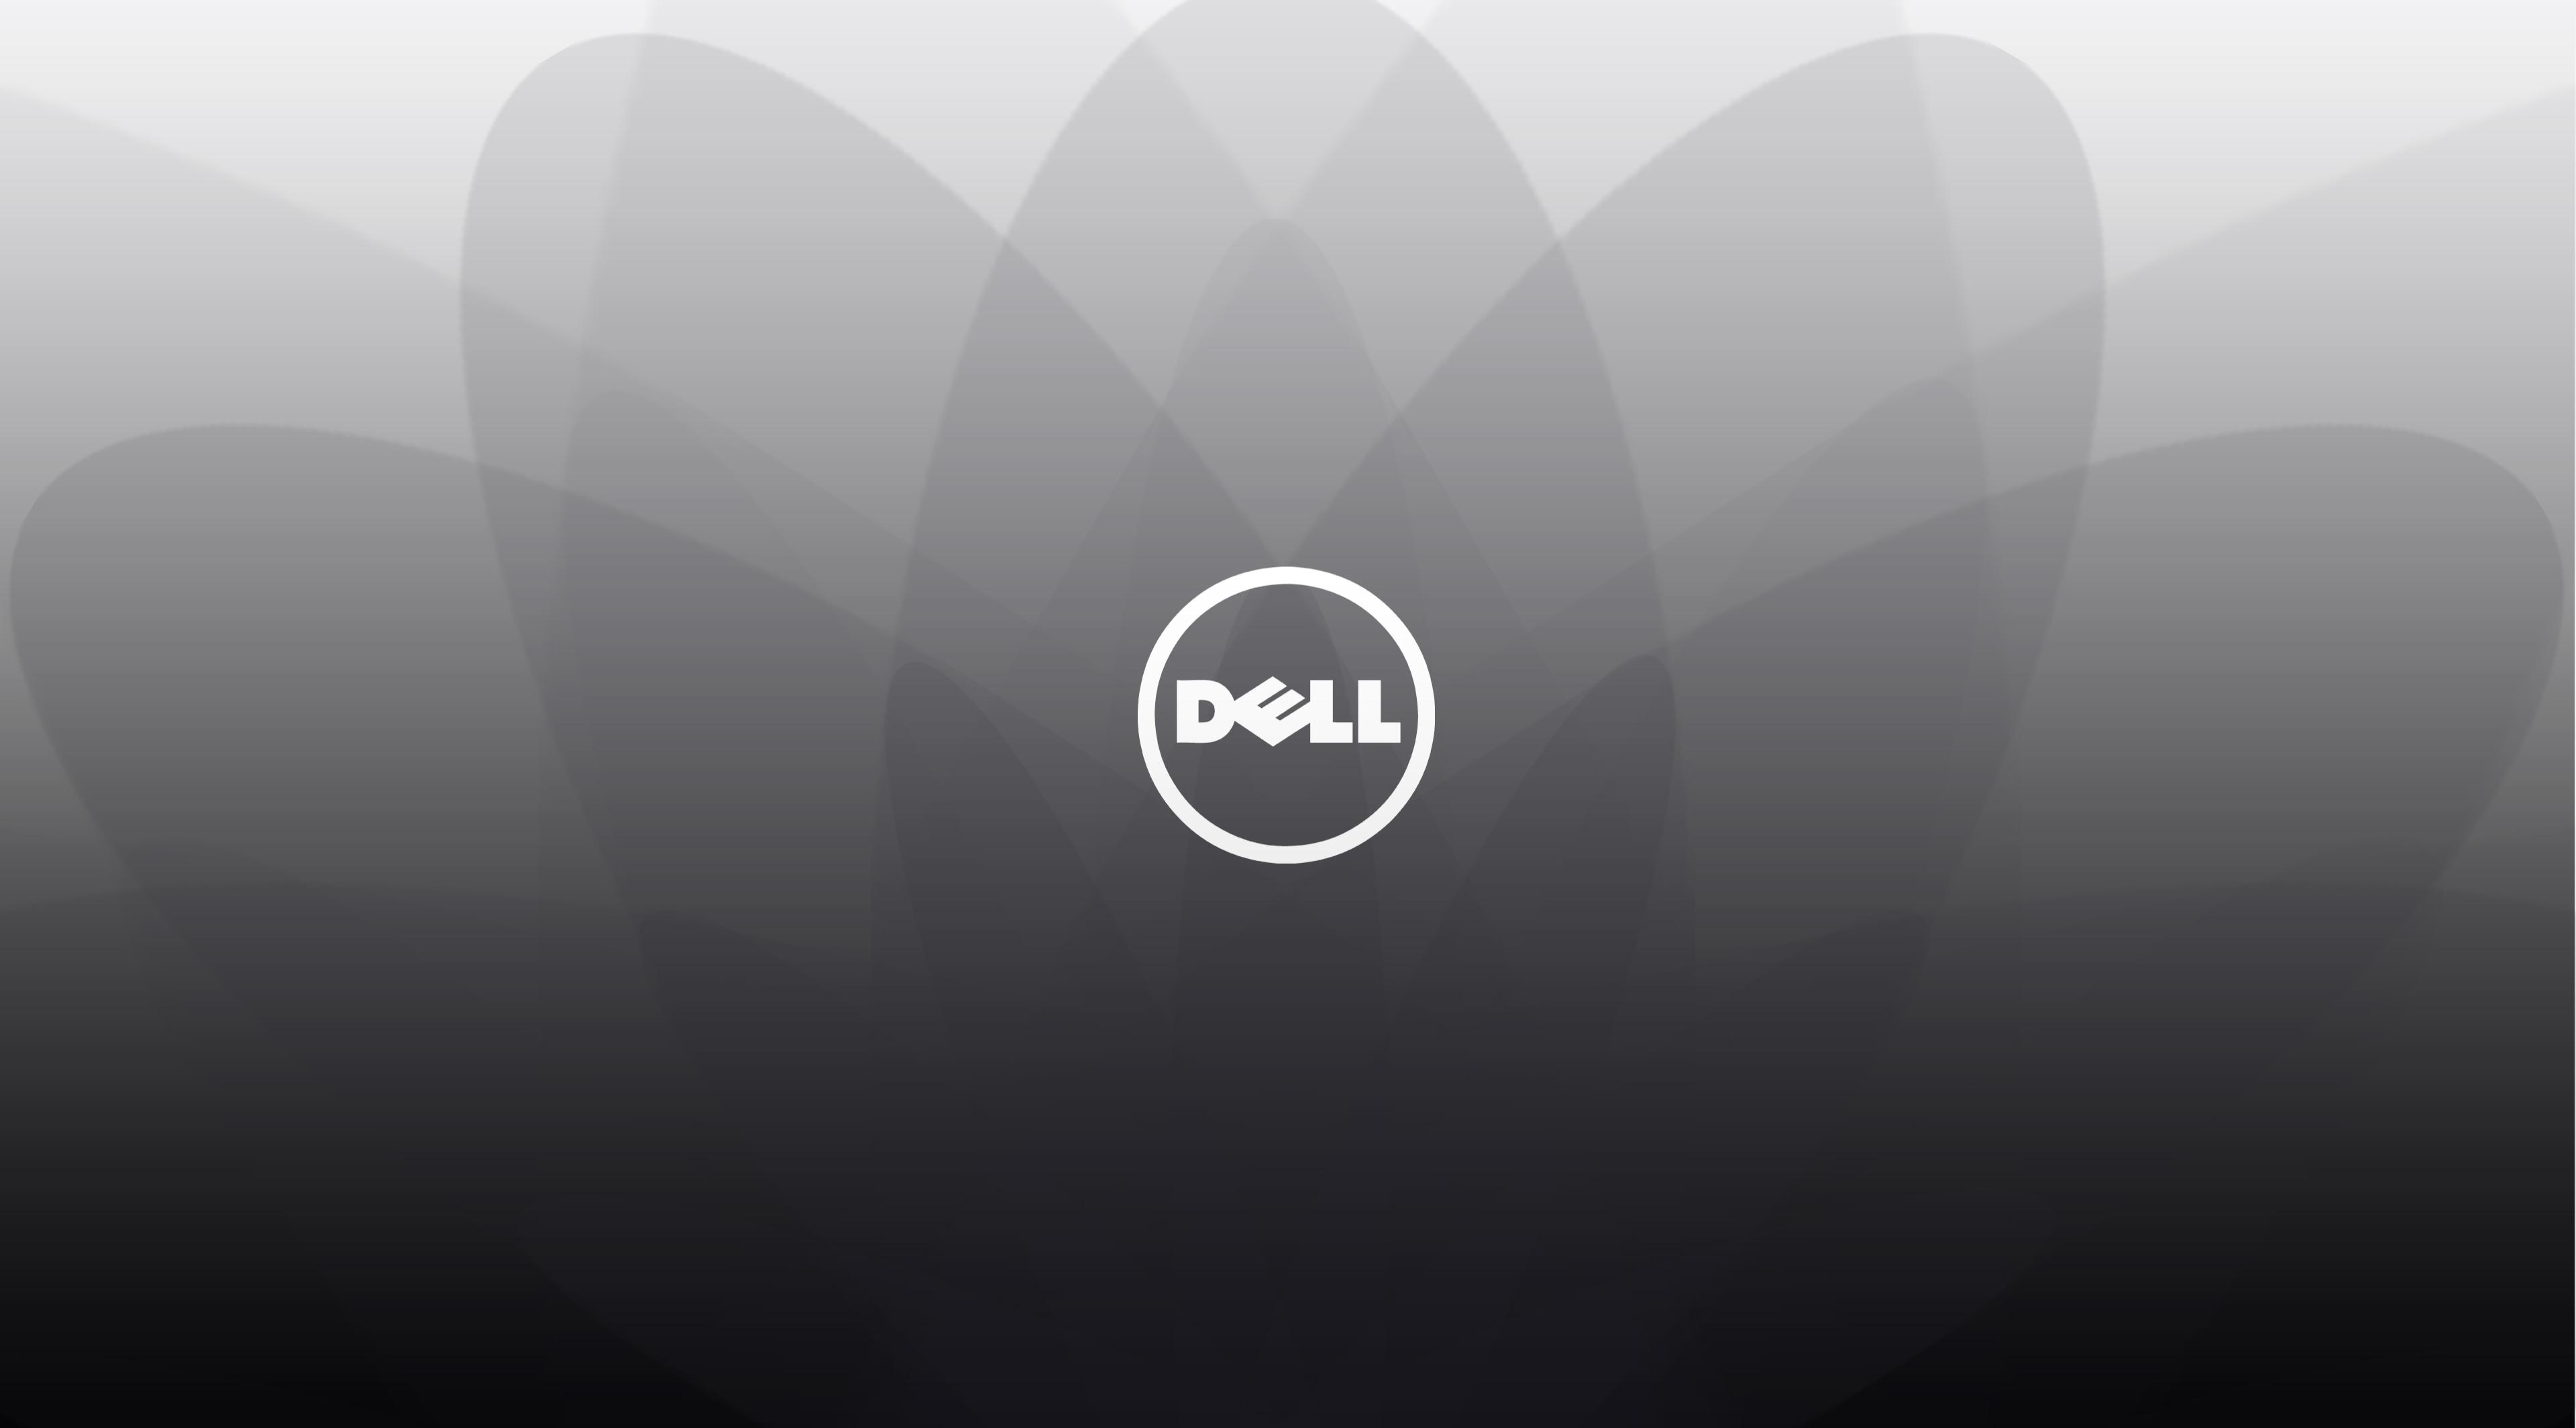 dell wallpaper,atmospheric phenomenon,font,logo,sky,atmosphere